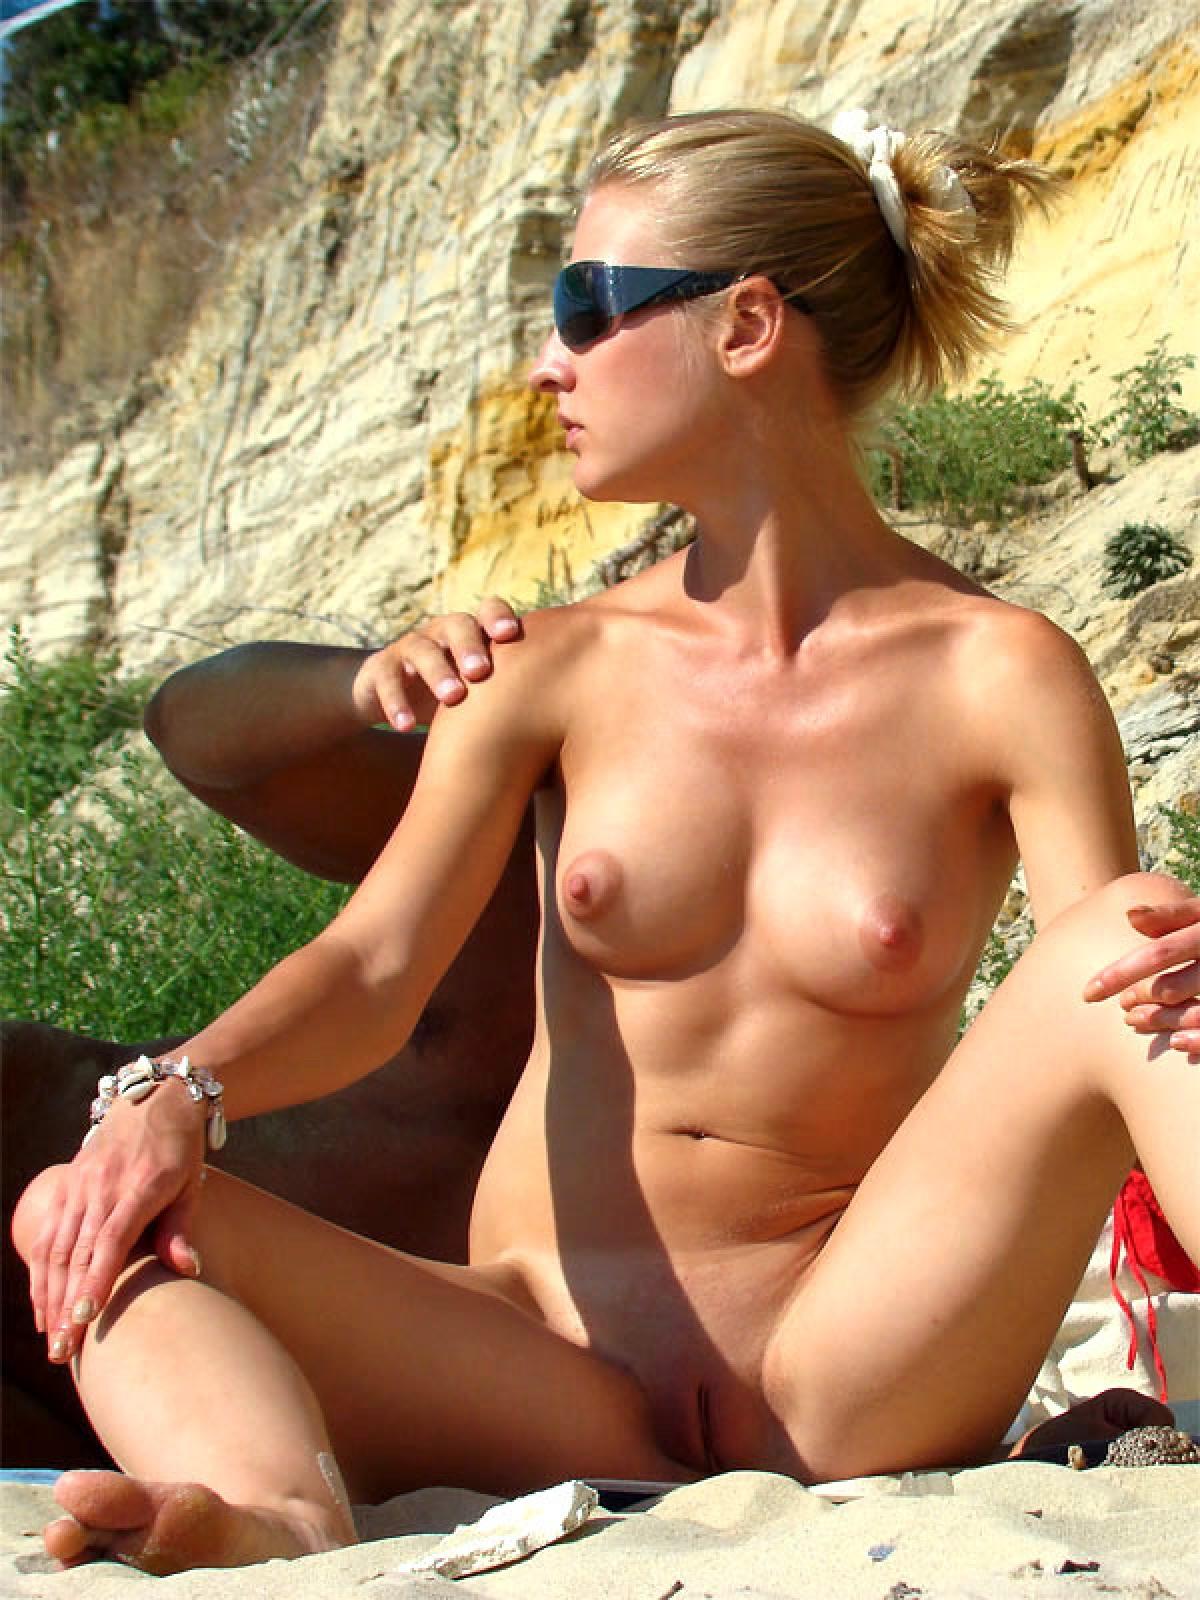 golie-golie-na-plazhe-video